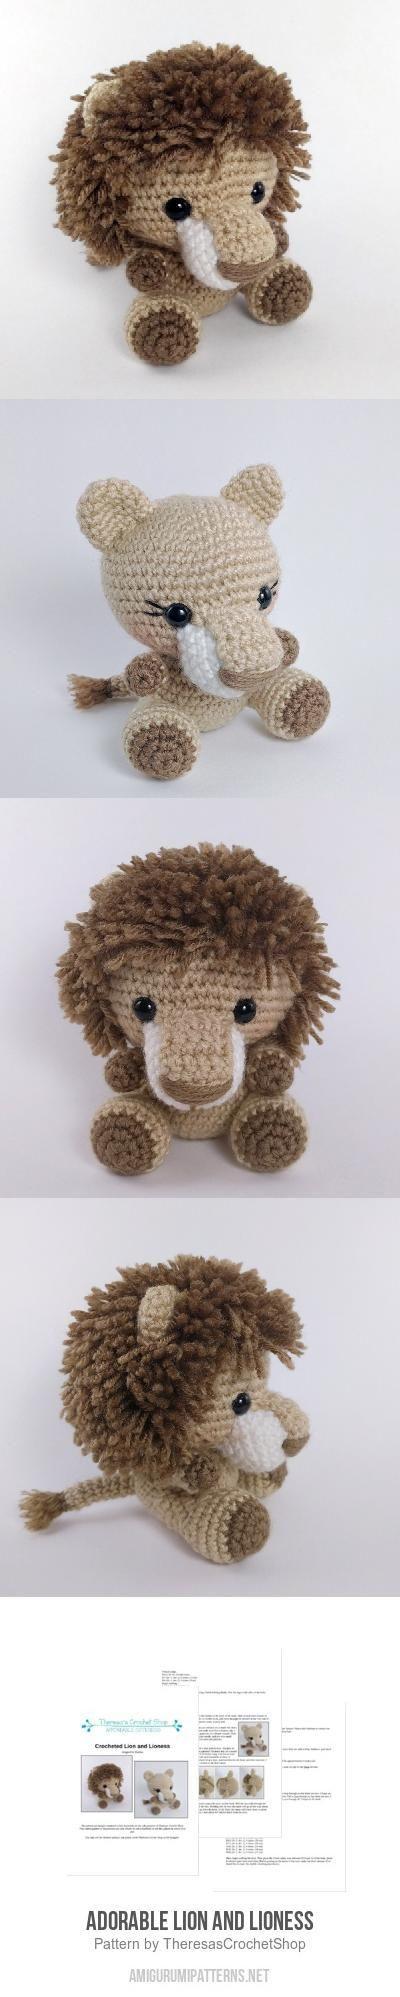 Adorable Lion And Lioness Amigurumi Pattern - Crochet Lion